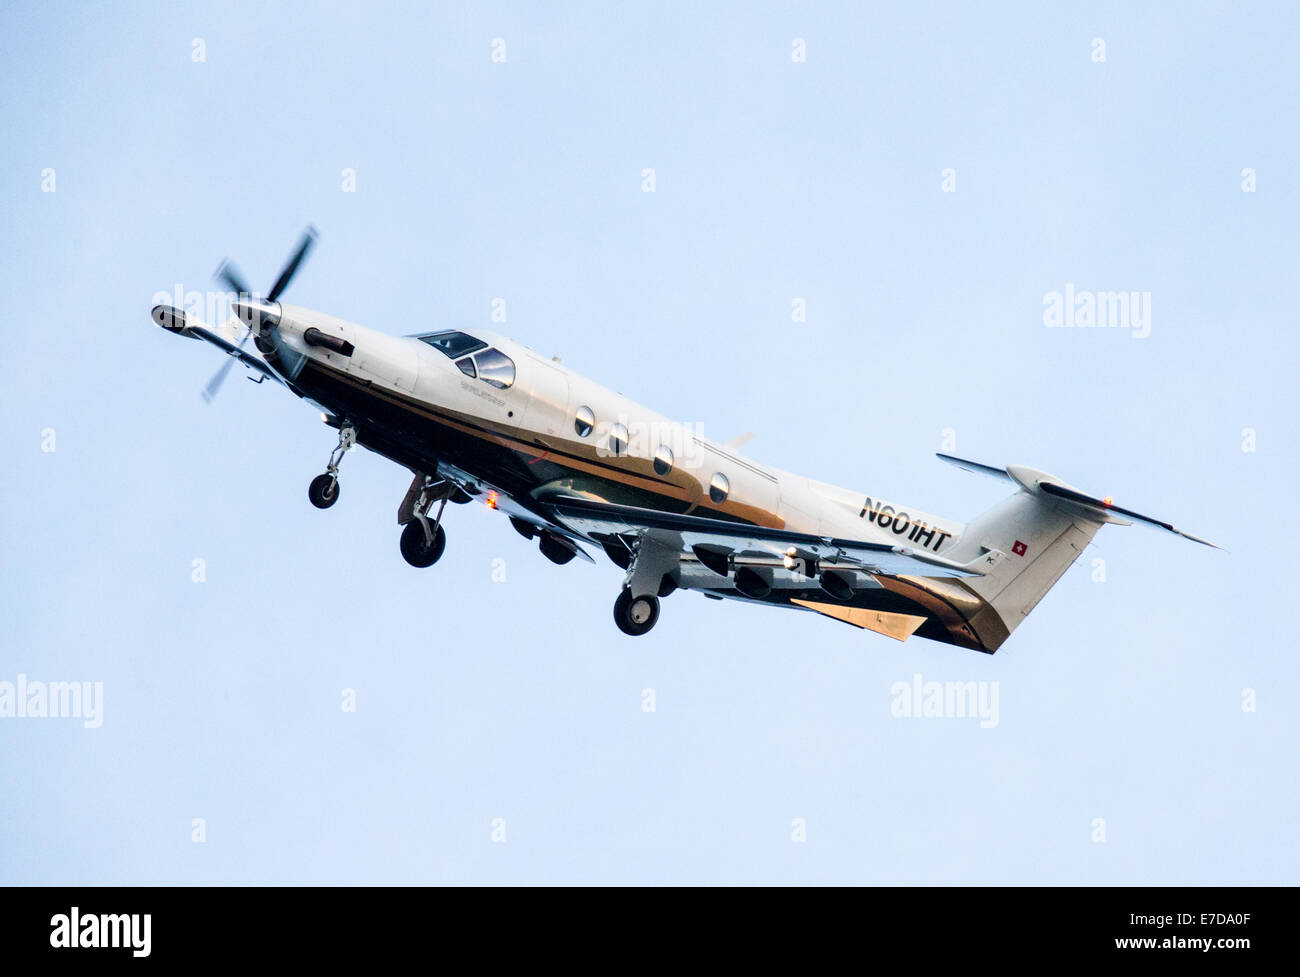 Swiss made, Pilatus PC-12 NG turboprop airplane preparing to land in Central Colorado, USA - Stock Image